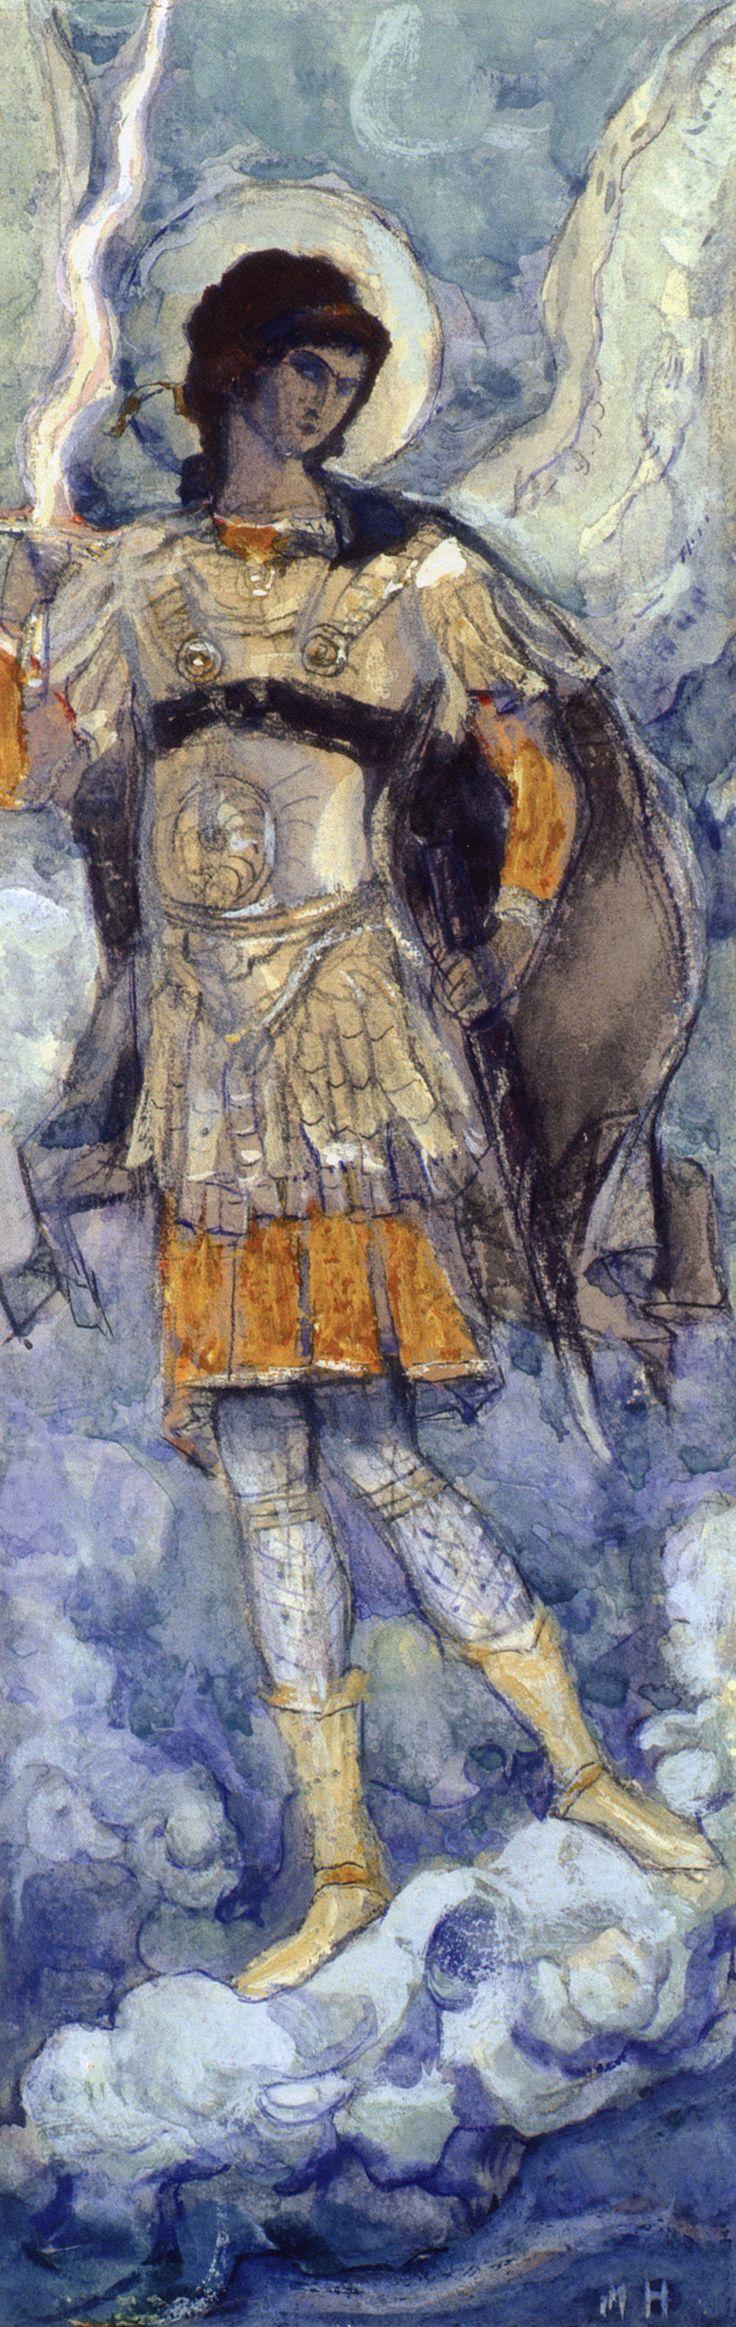 Нестеров М.. Архангел Михаил. 1913-1914